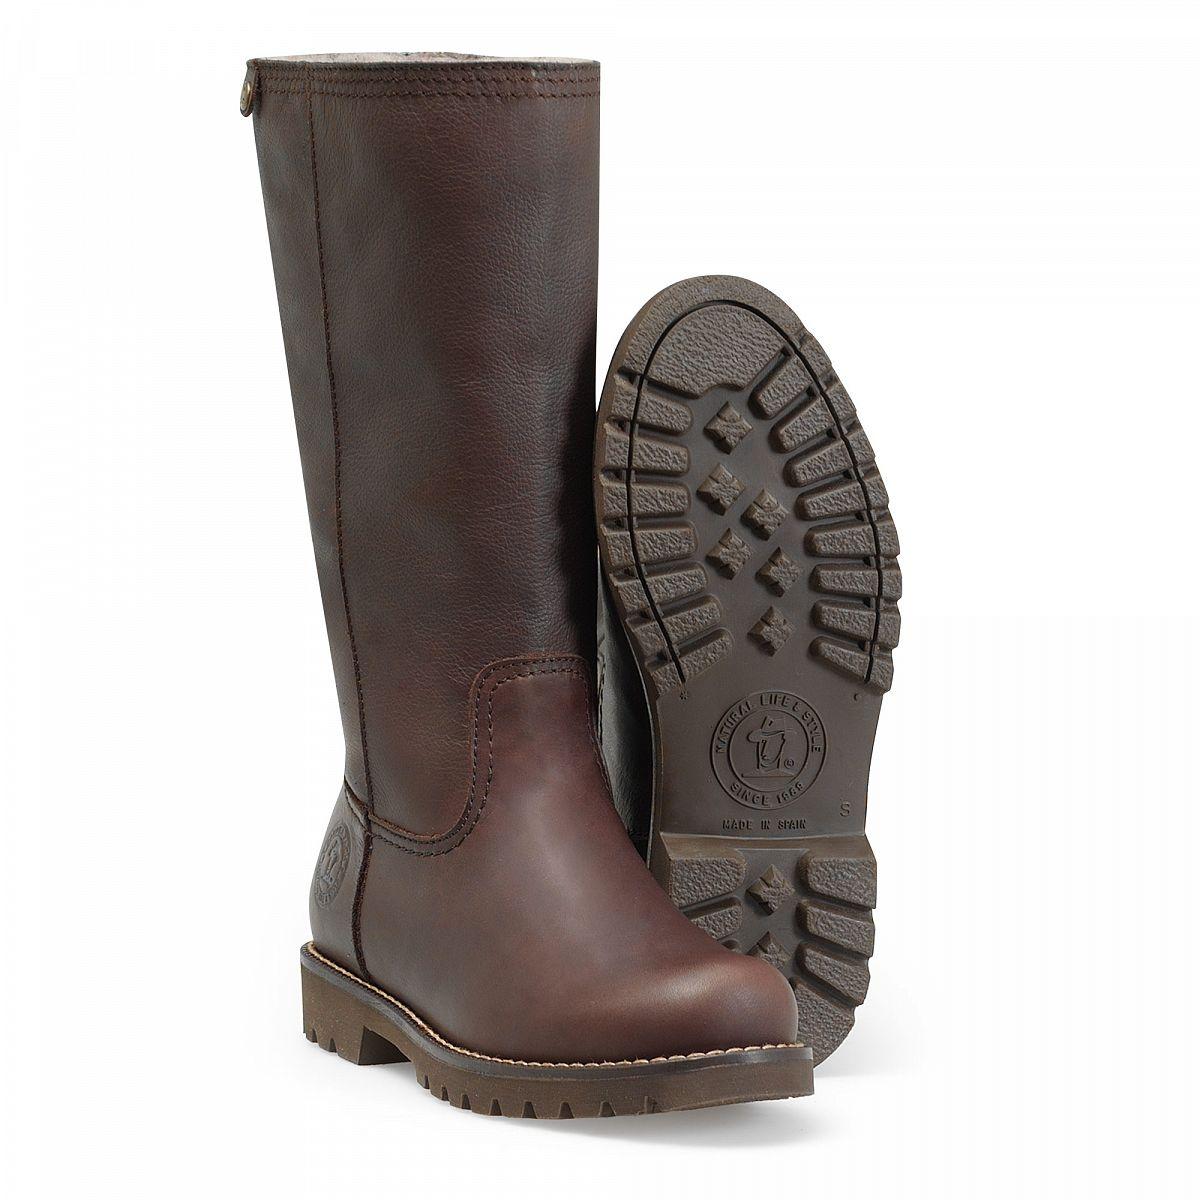 Panama Jack BAMBINA IGLOO - Winter boots - marron/brown K2KmuLL